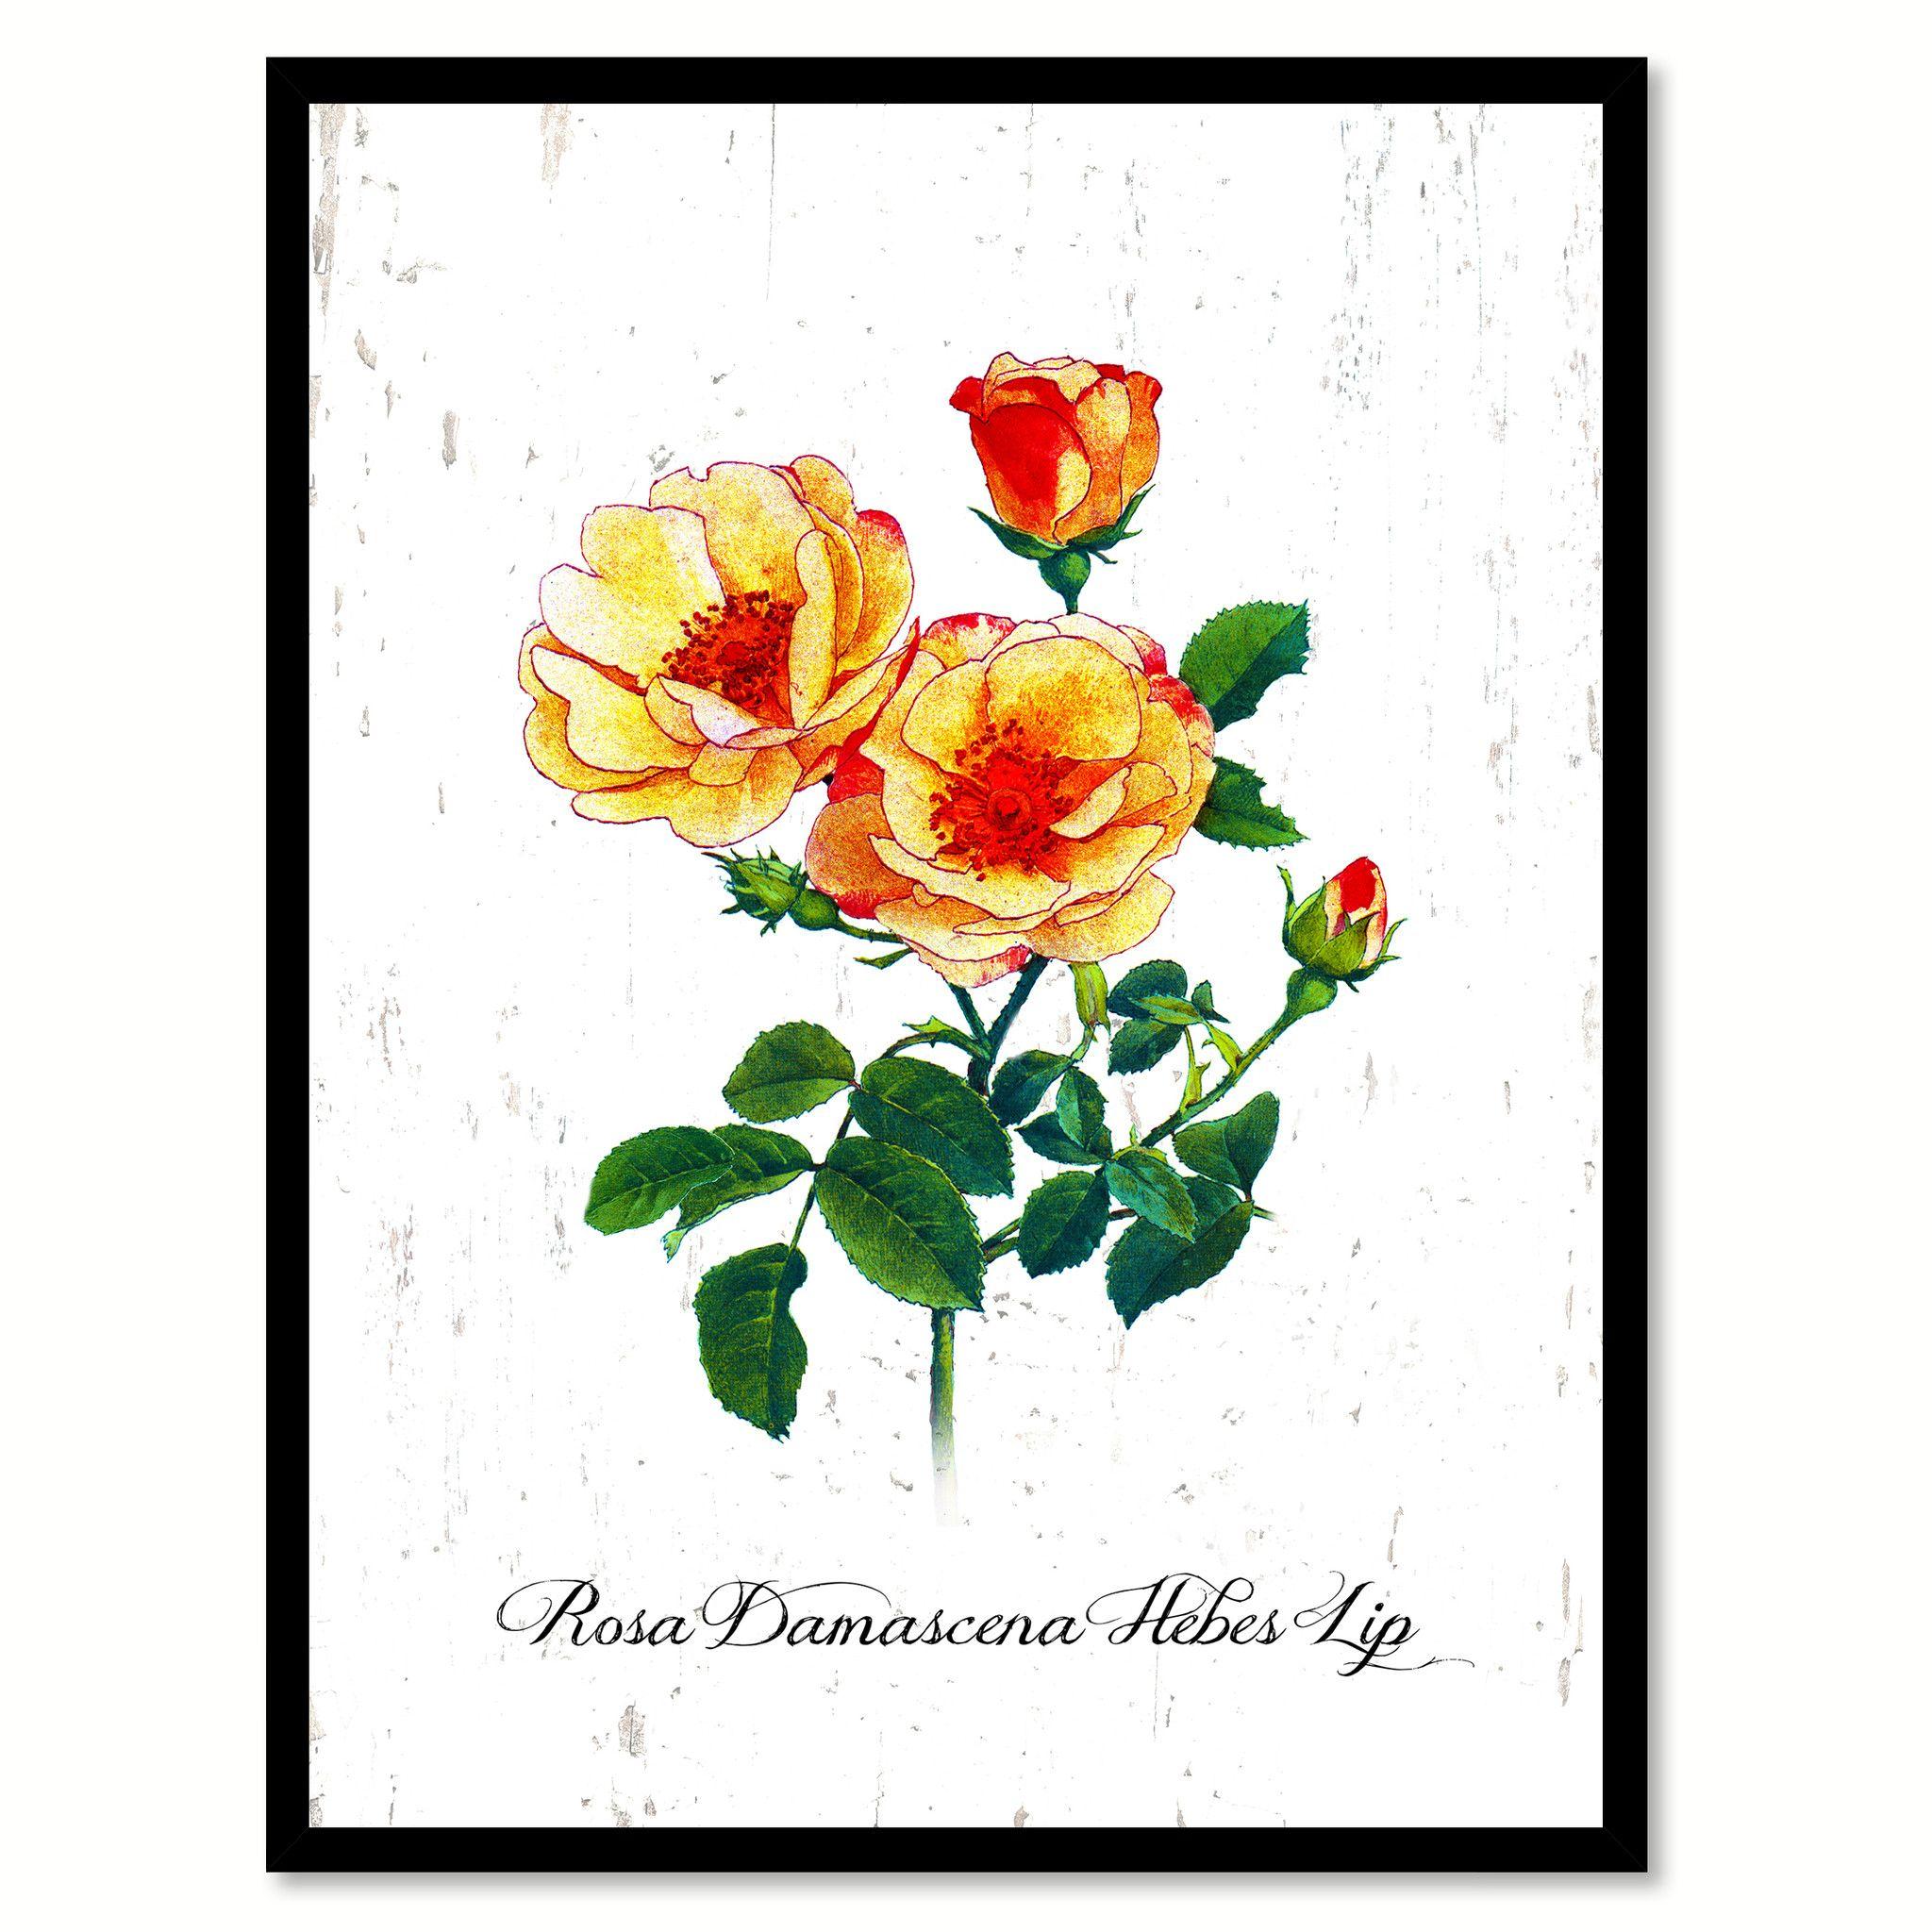 Yellow Damascena Hebes Lip Rose Flower Framed Canvas Print Gift Ideas Home Décor Wall Art